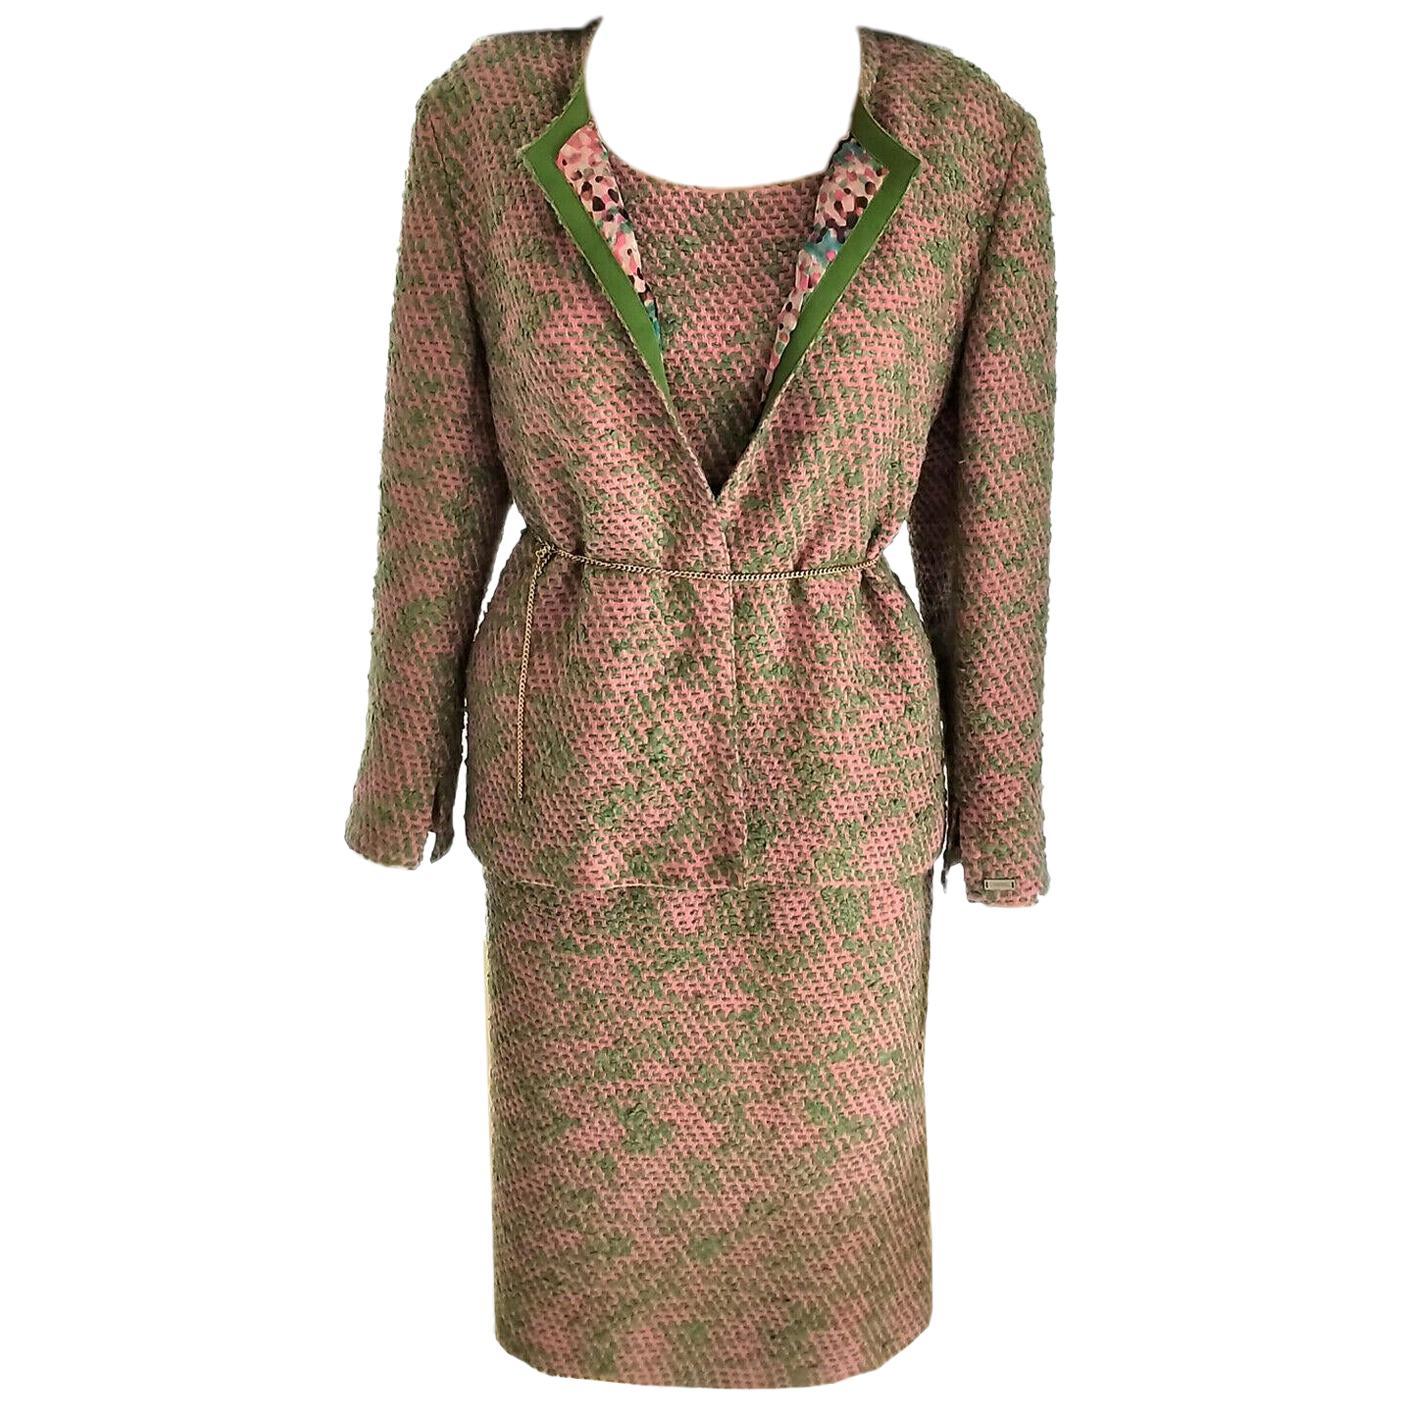 Vintage Chanel 1999 99A 3 Pc Pink & Multi Color Tweed Jacket Suit FR 44/ US 10